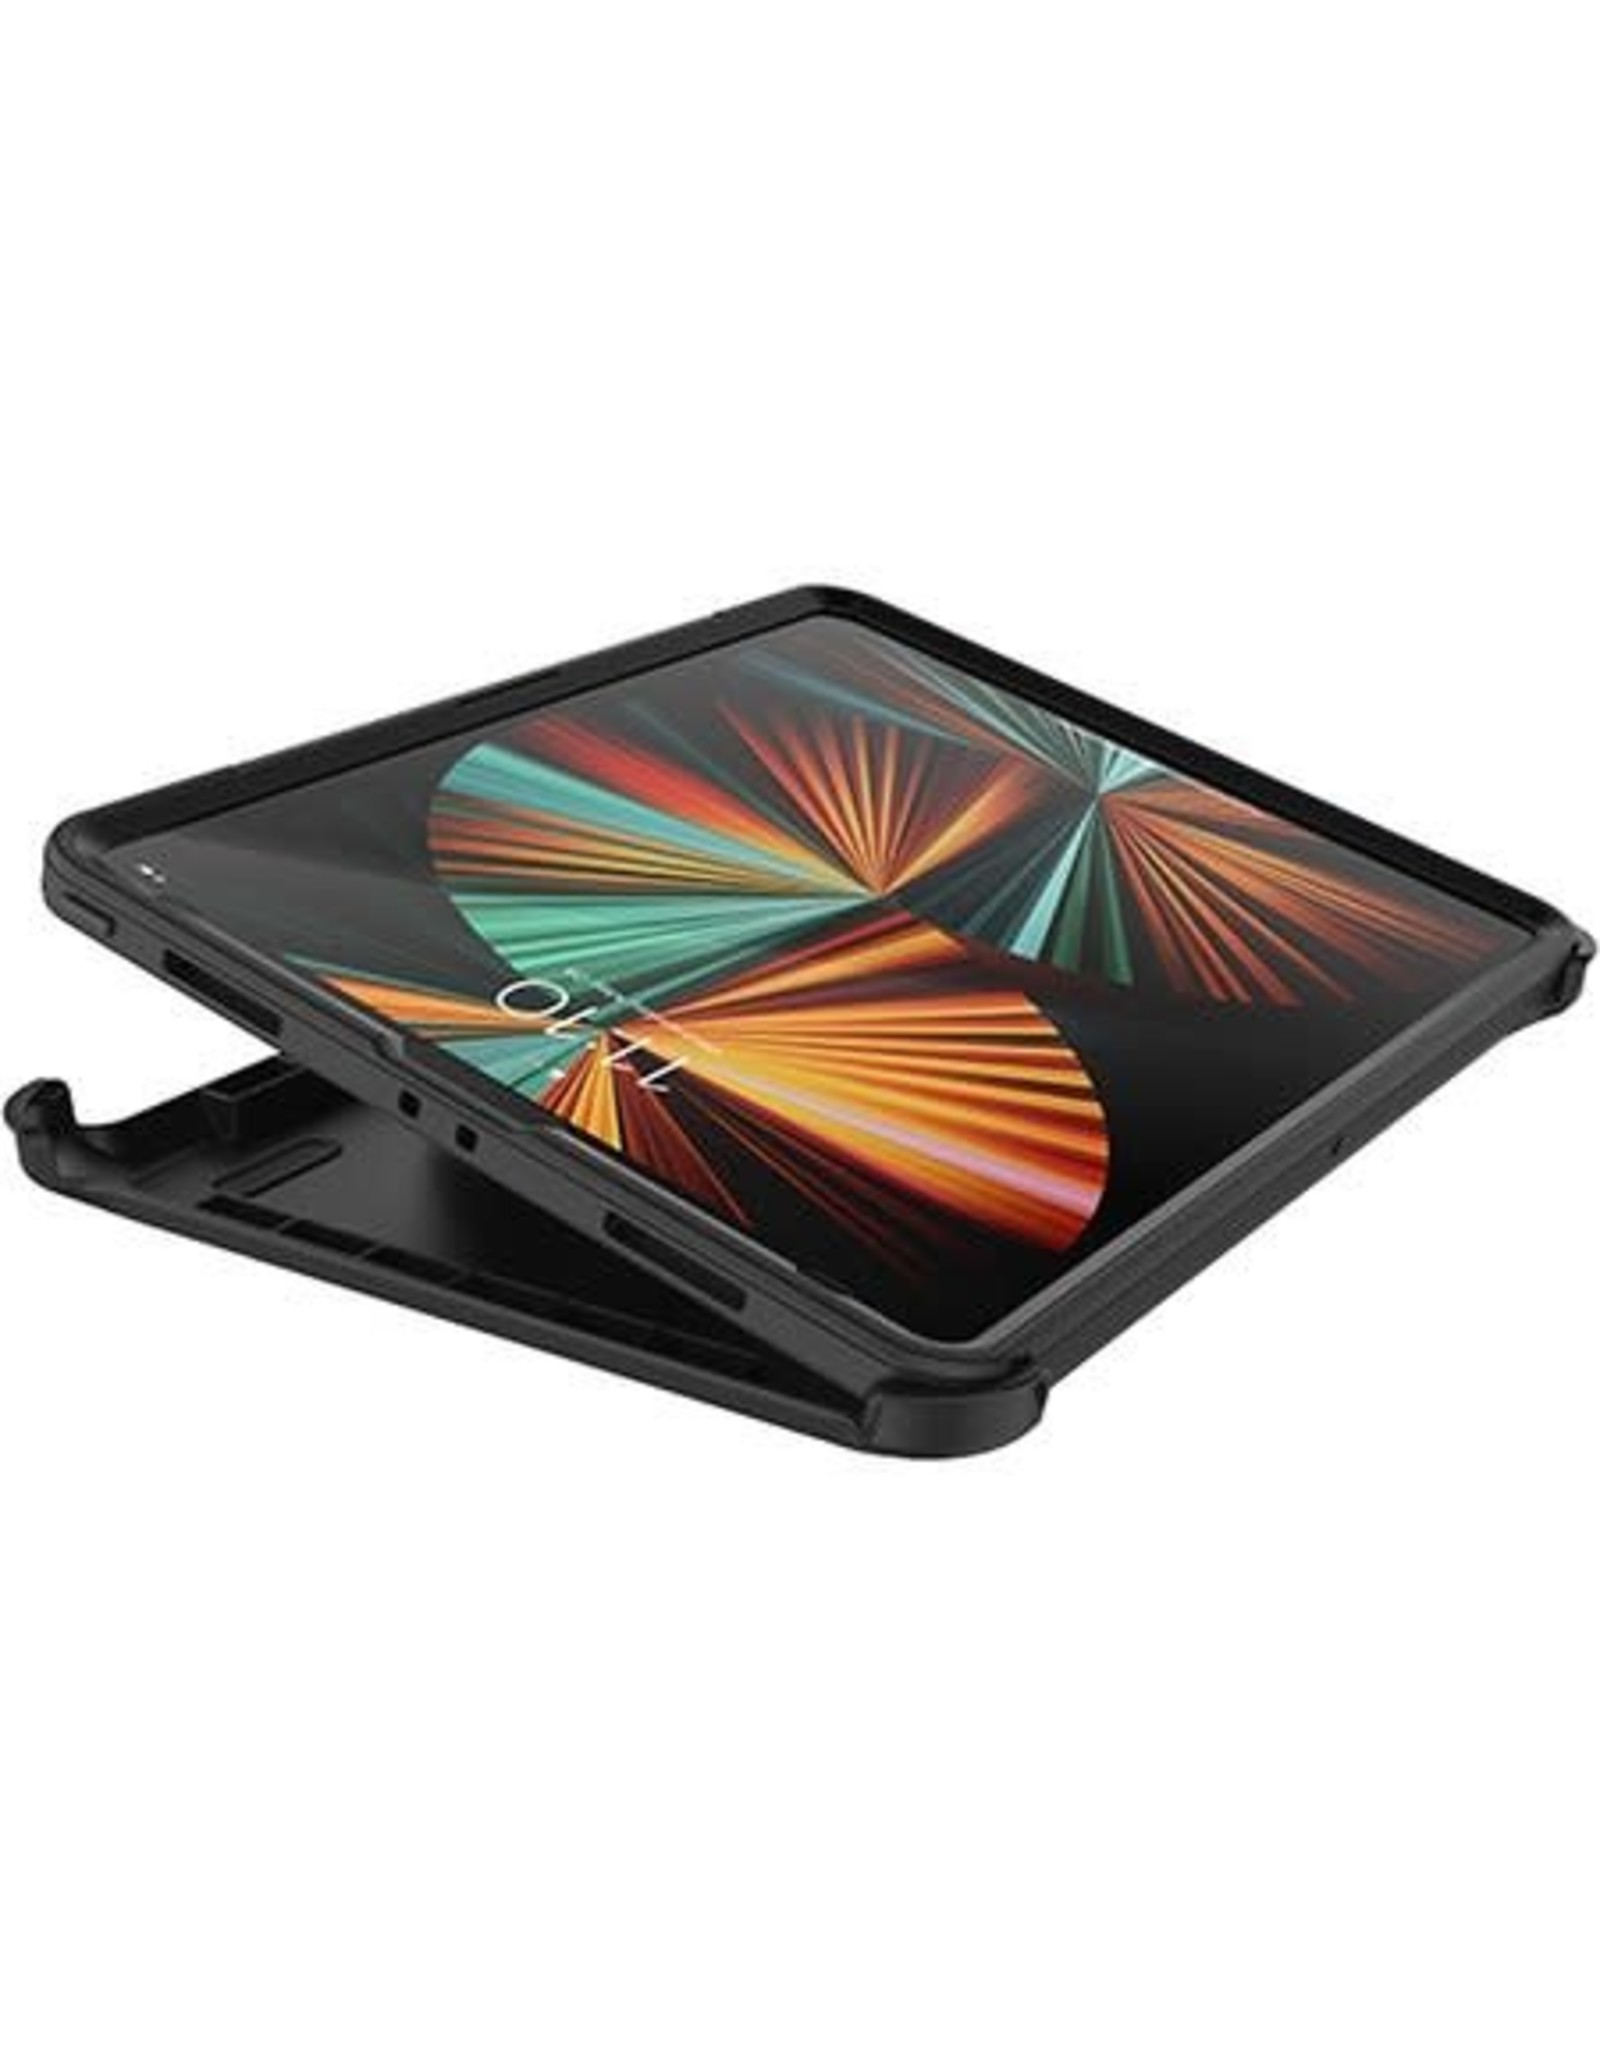 Otterbox OtterBox Defender Case For iPad Pro (12.9-inch) (5th gen/4th gen/3rd gen)